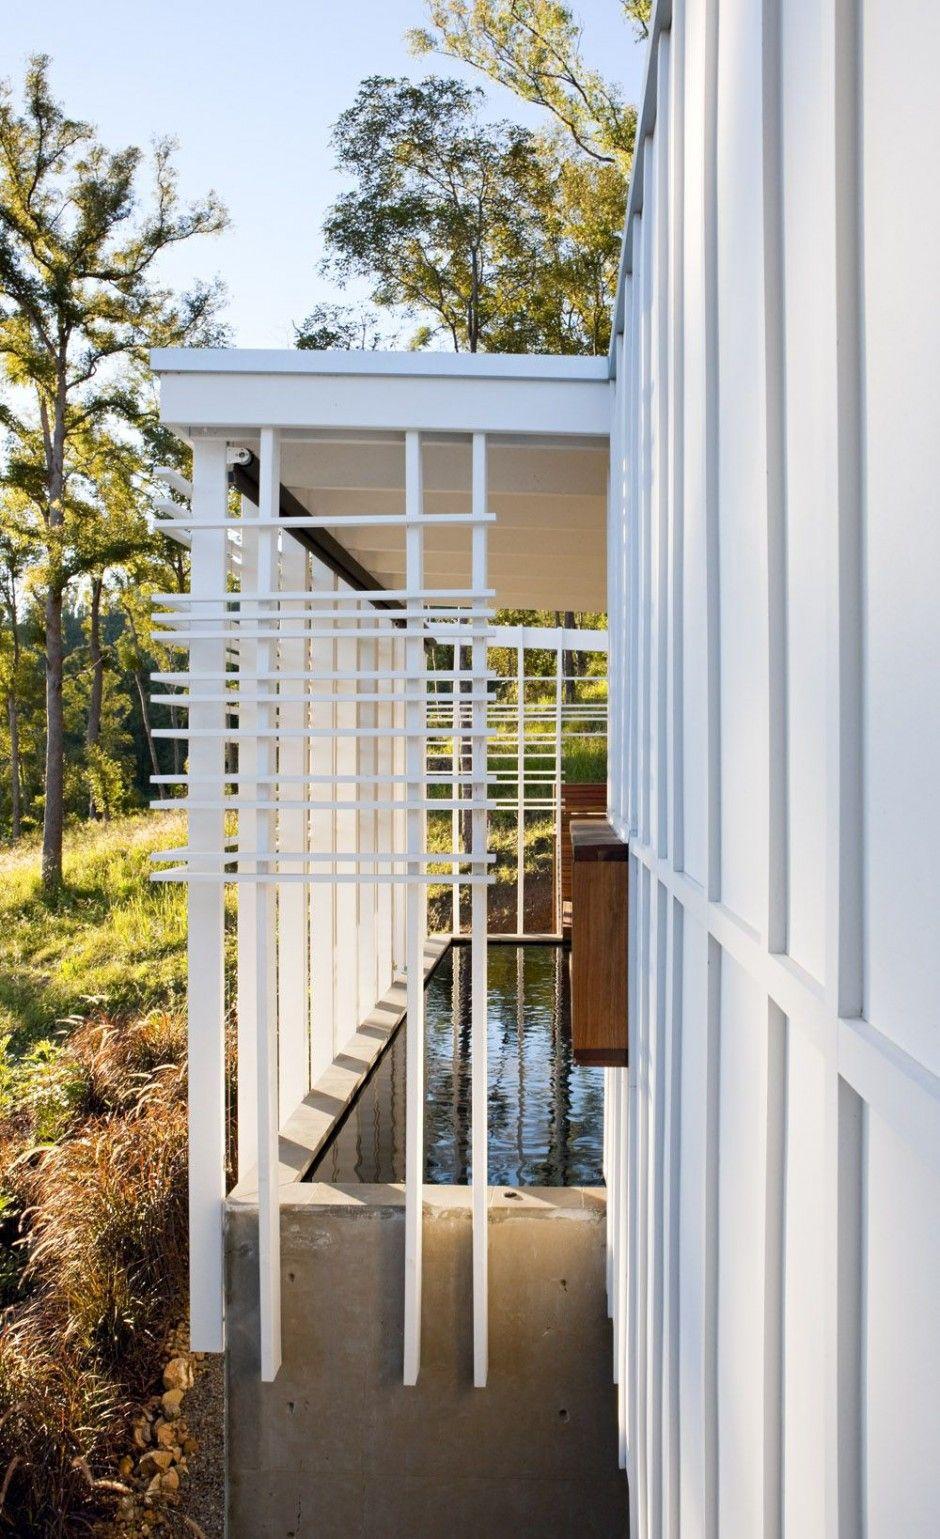 Stonehawke House by Base Architecture June 8th, 2014 Base Architecture designed the Stonehawke House in Brisbane, Australia.